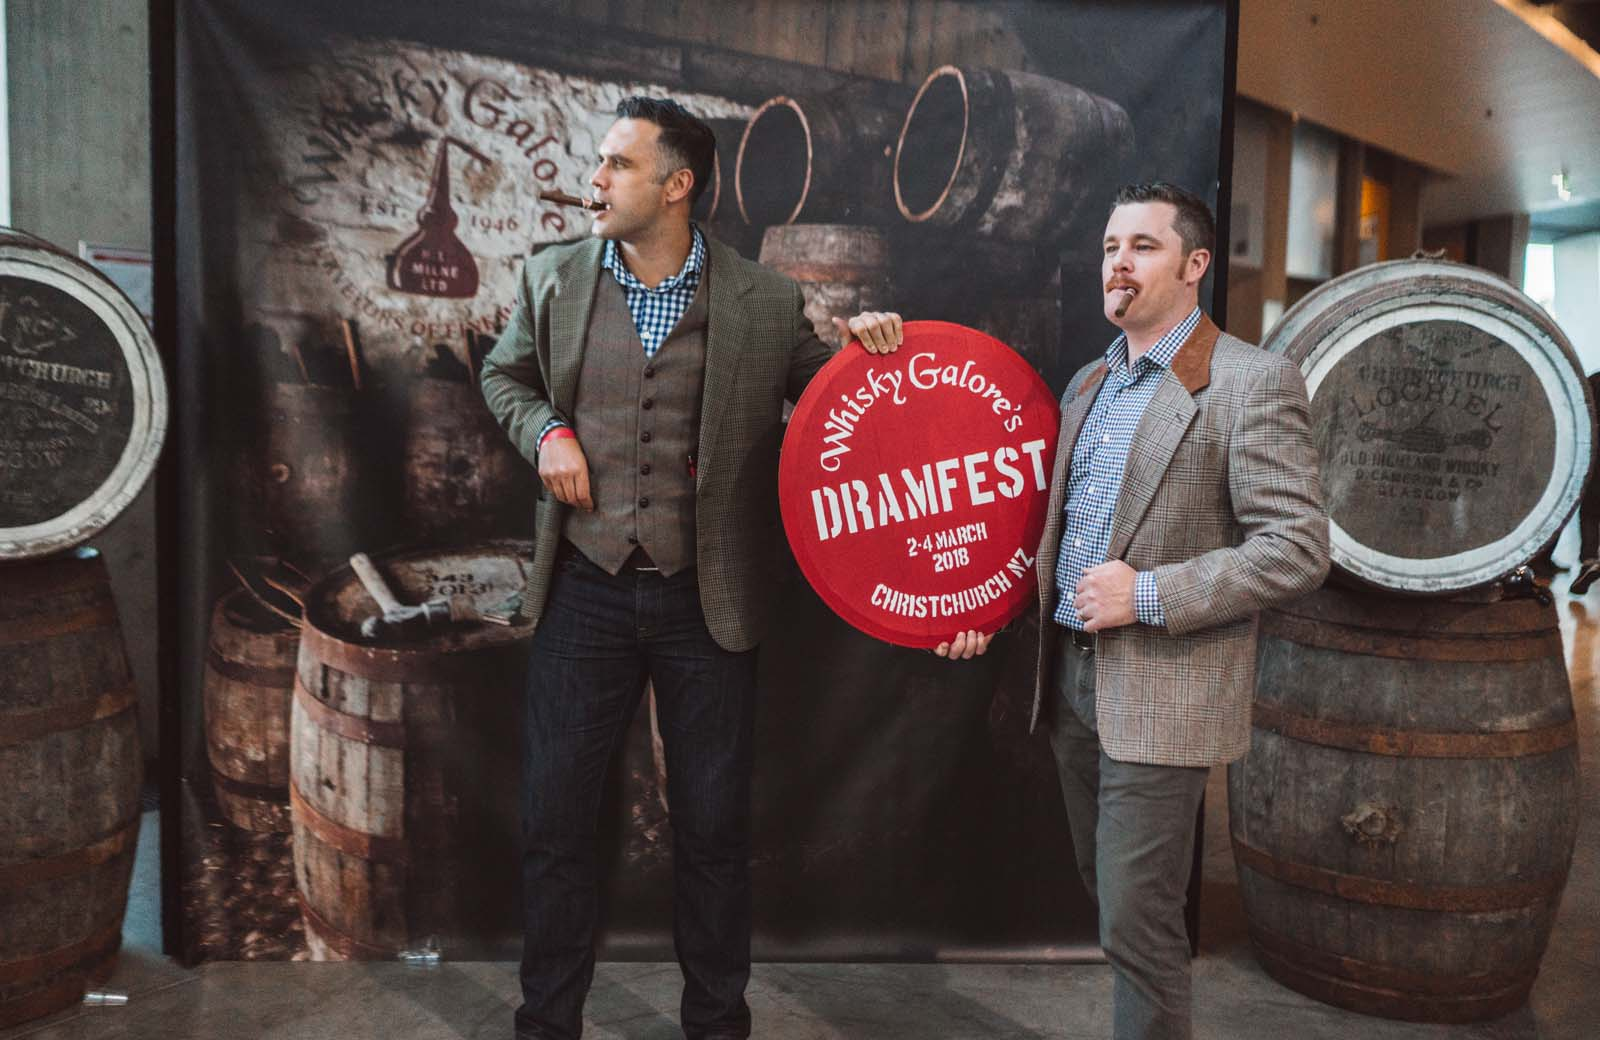 Dramfest 2018 for Whisky Galore-173.jpg